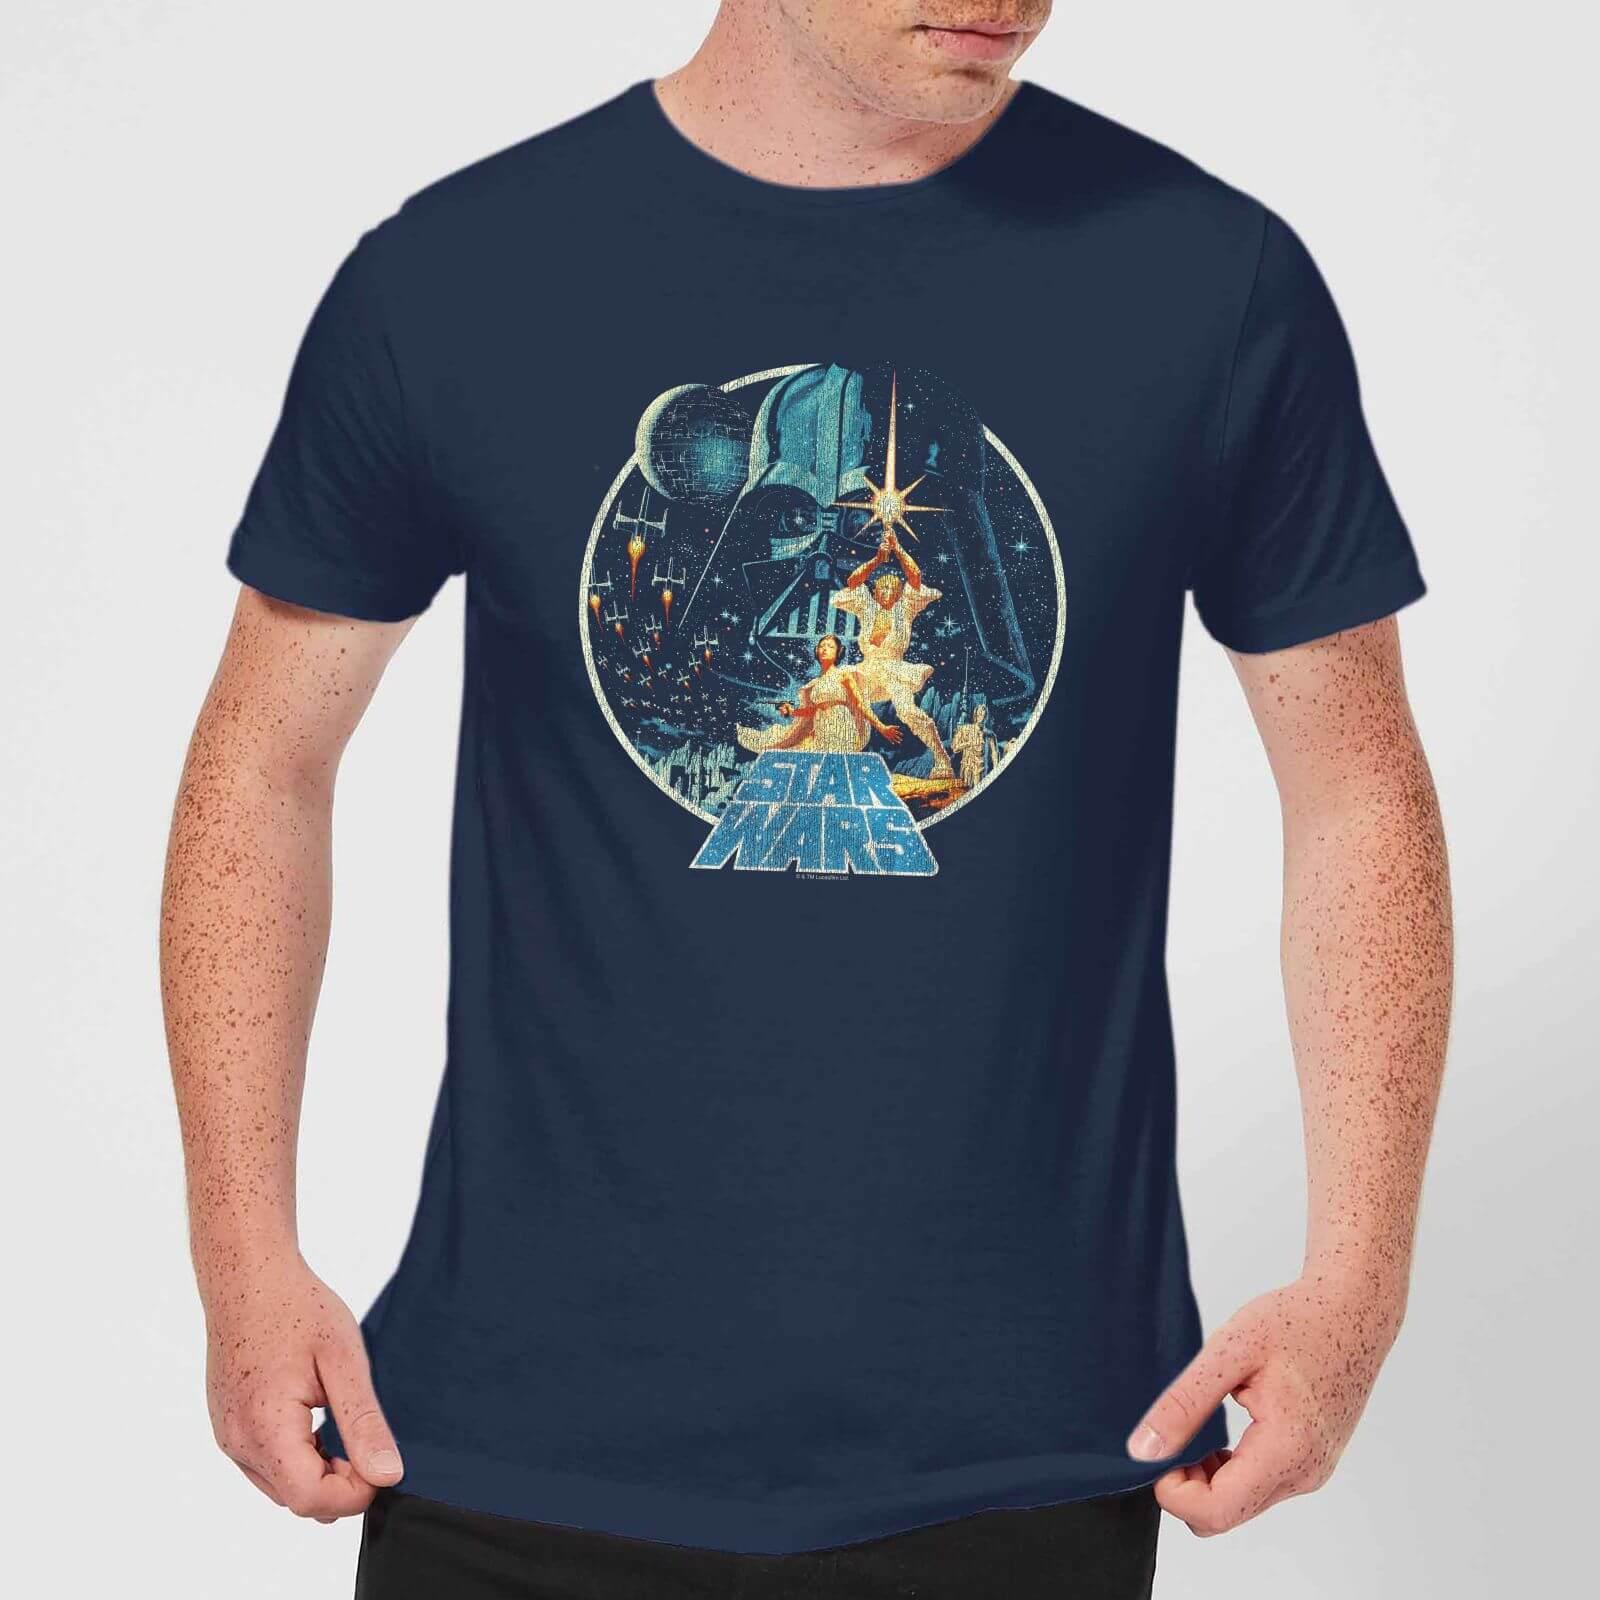 super popular talla 7 marca famosa camisa azul marino con